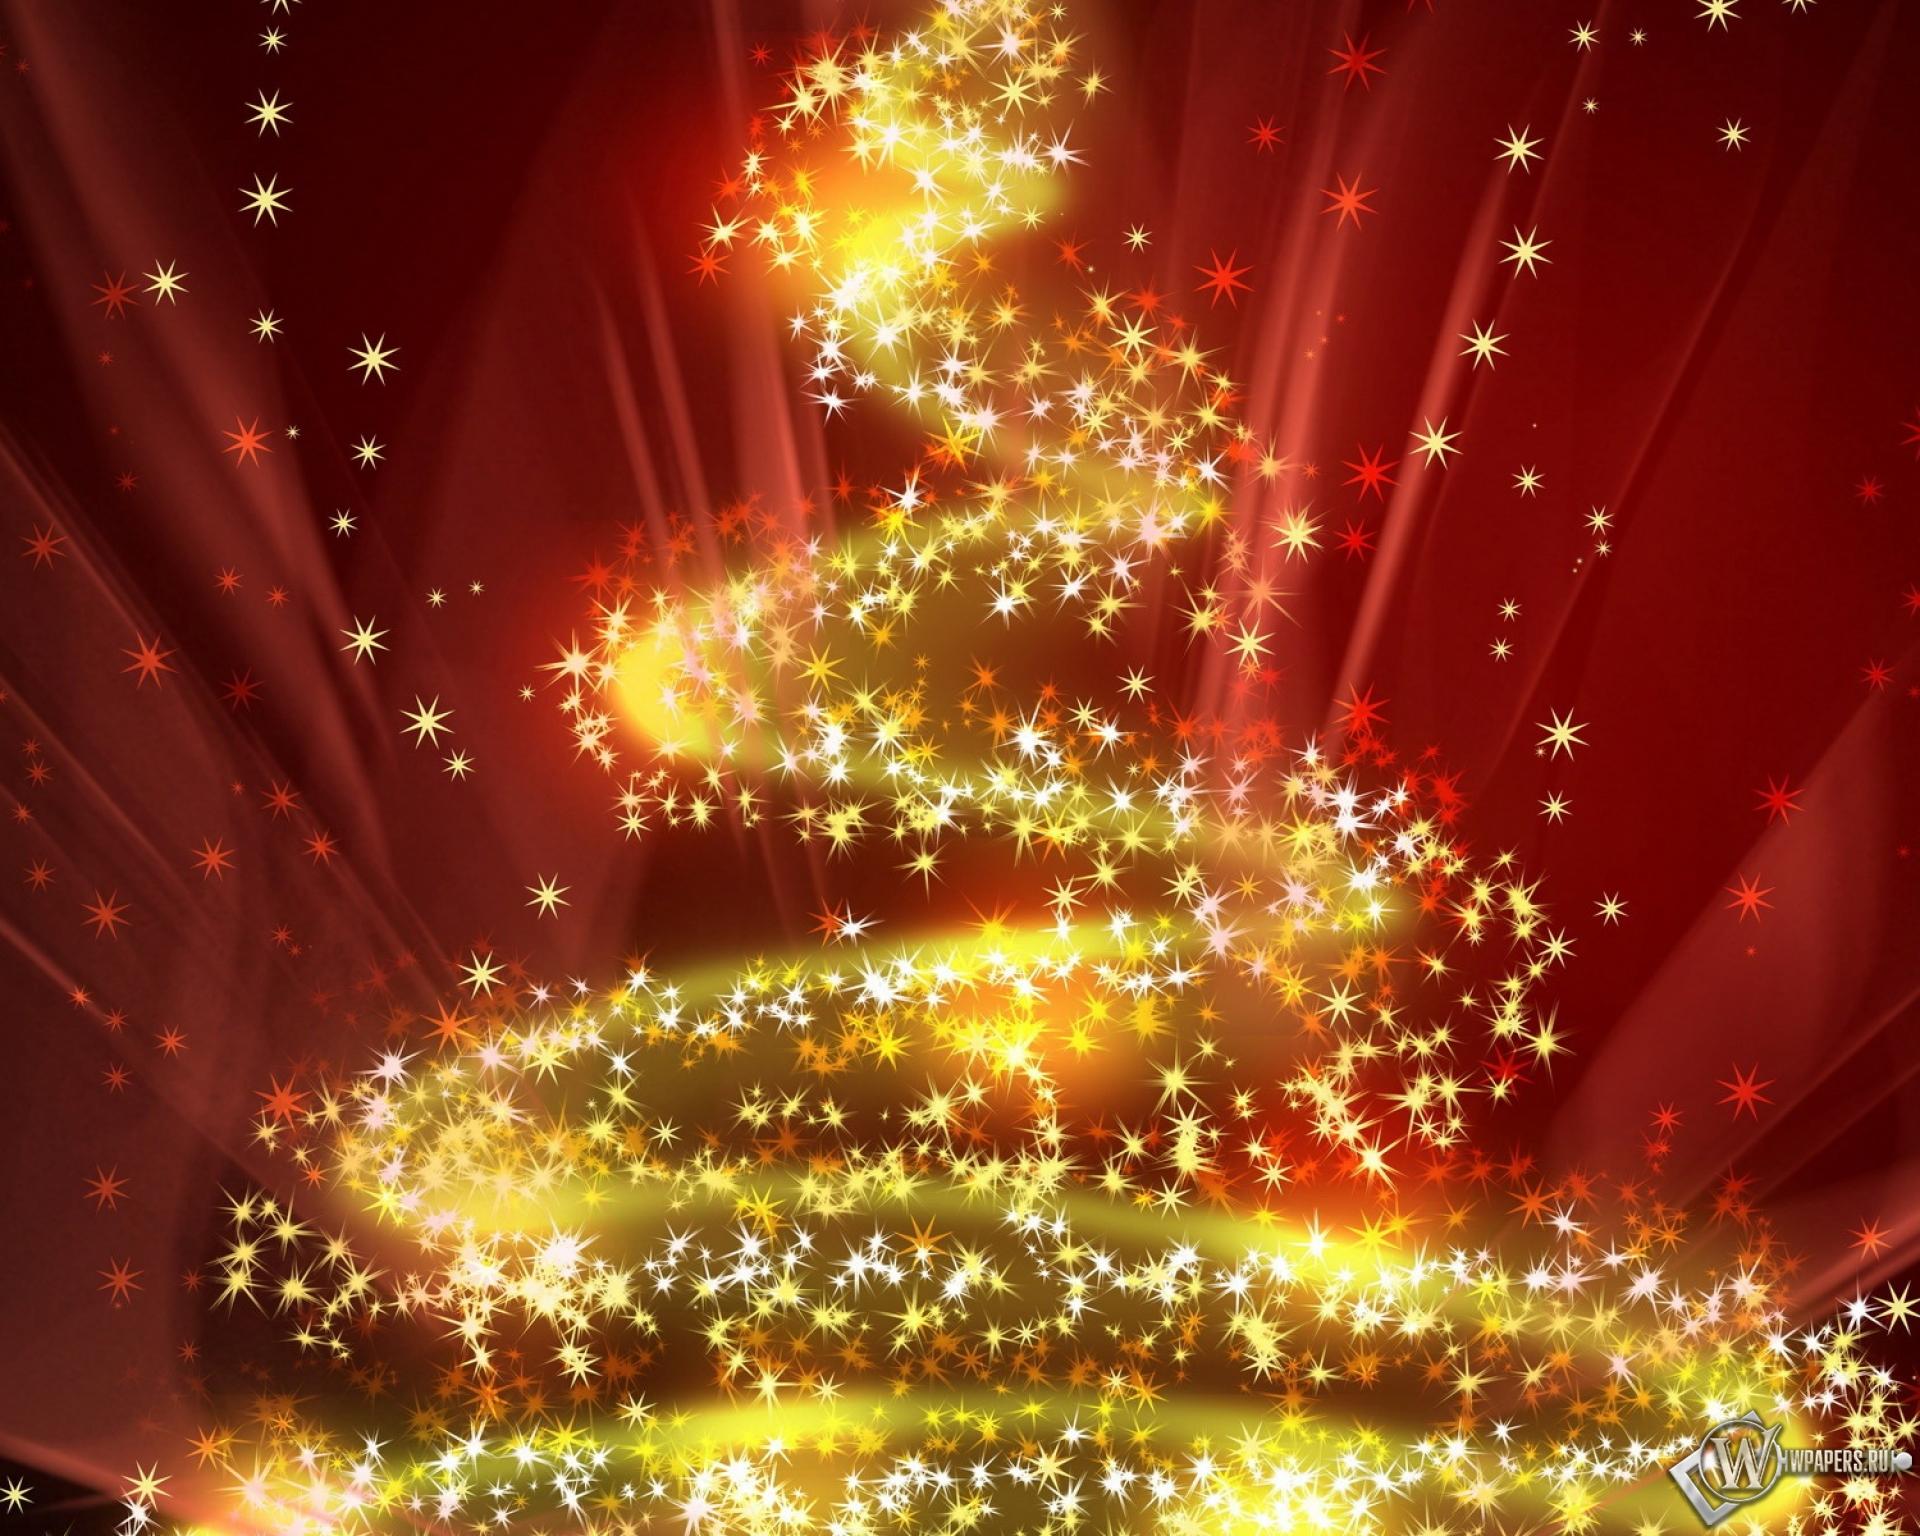 Скачать/Download Merry Christmas Wallpapers 3 2011. Crysis 2 Crack